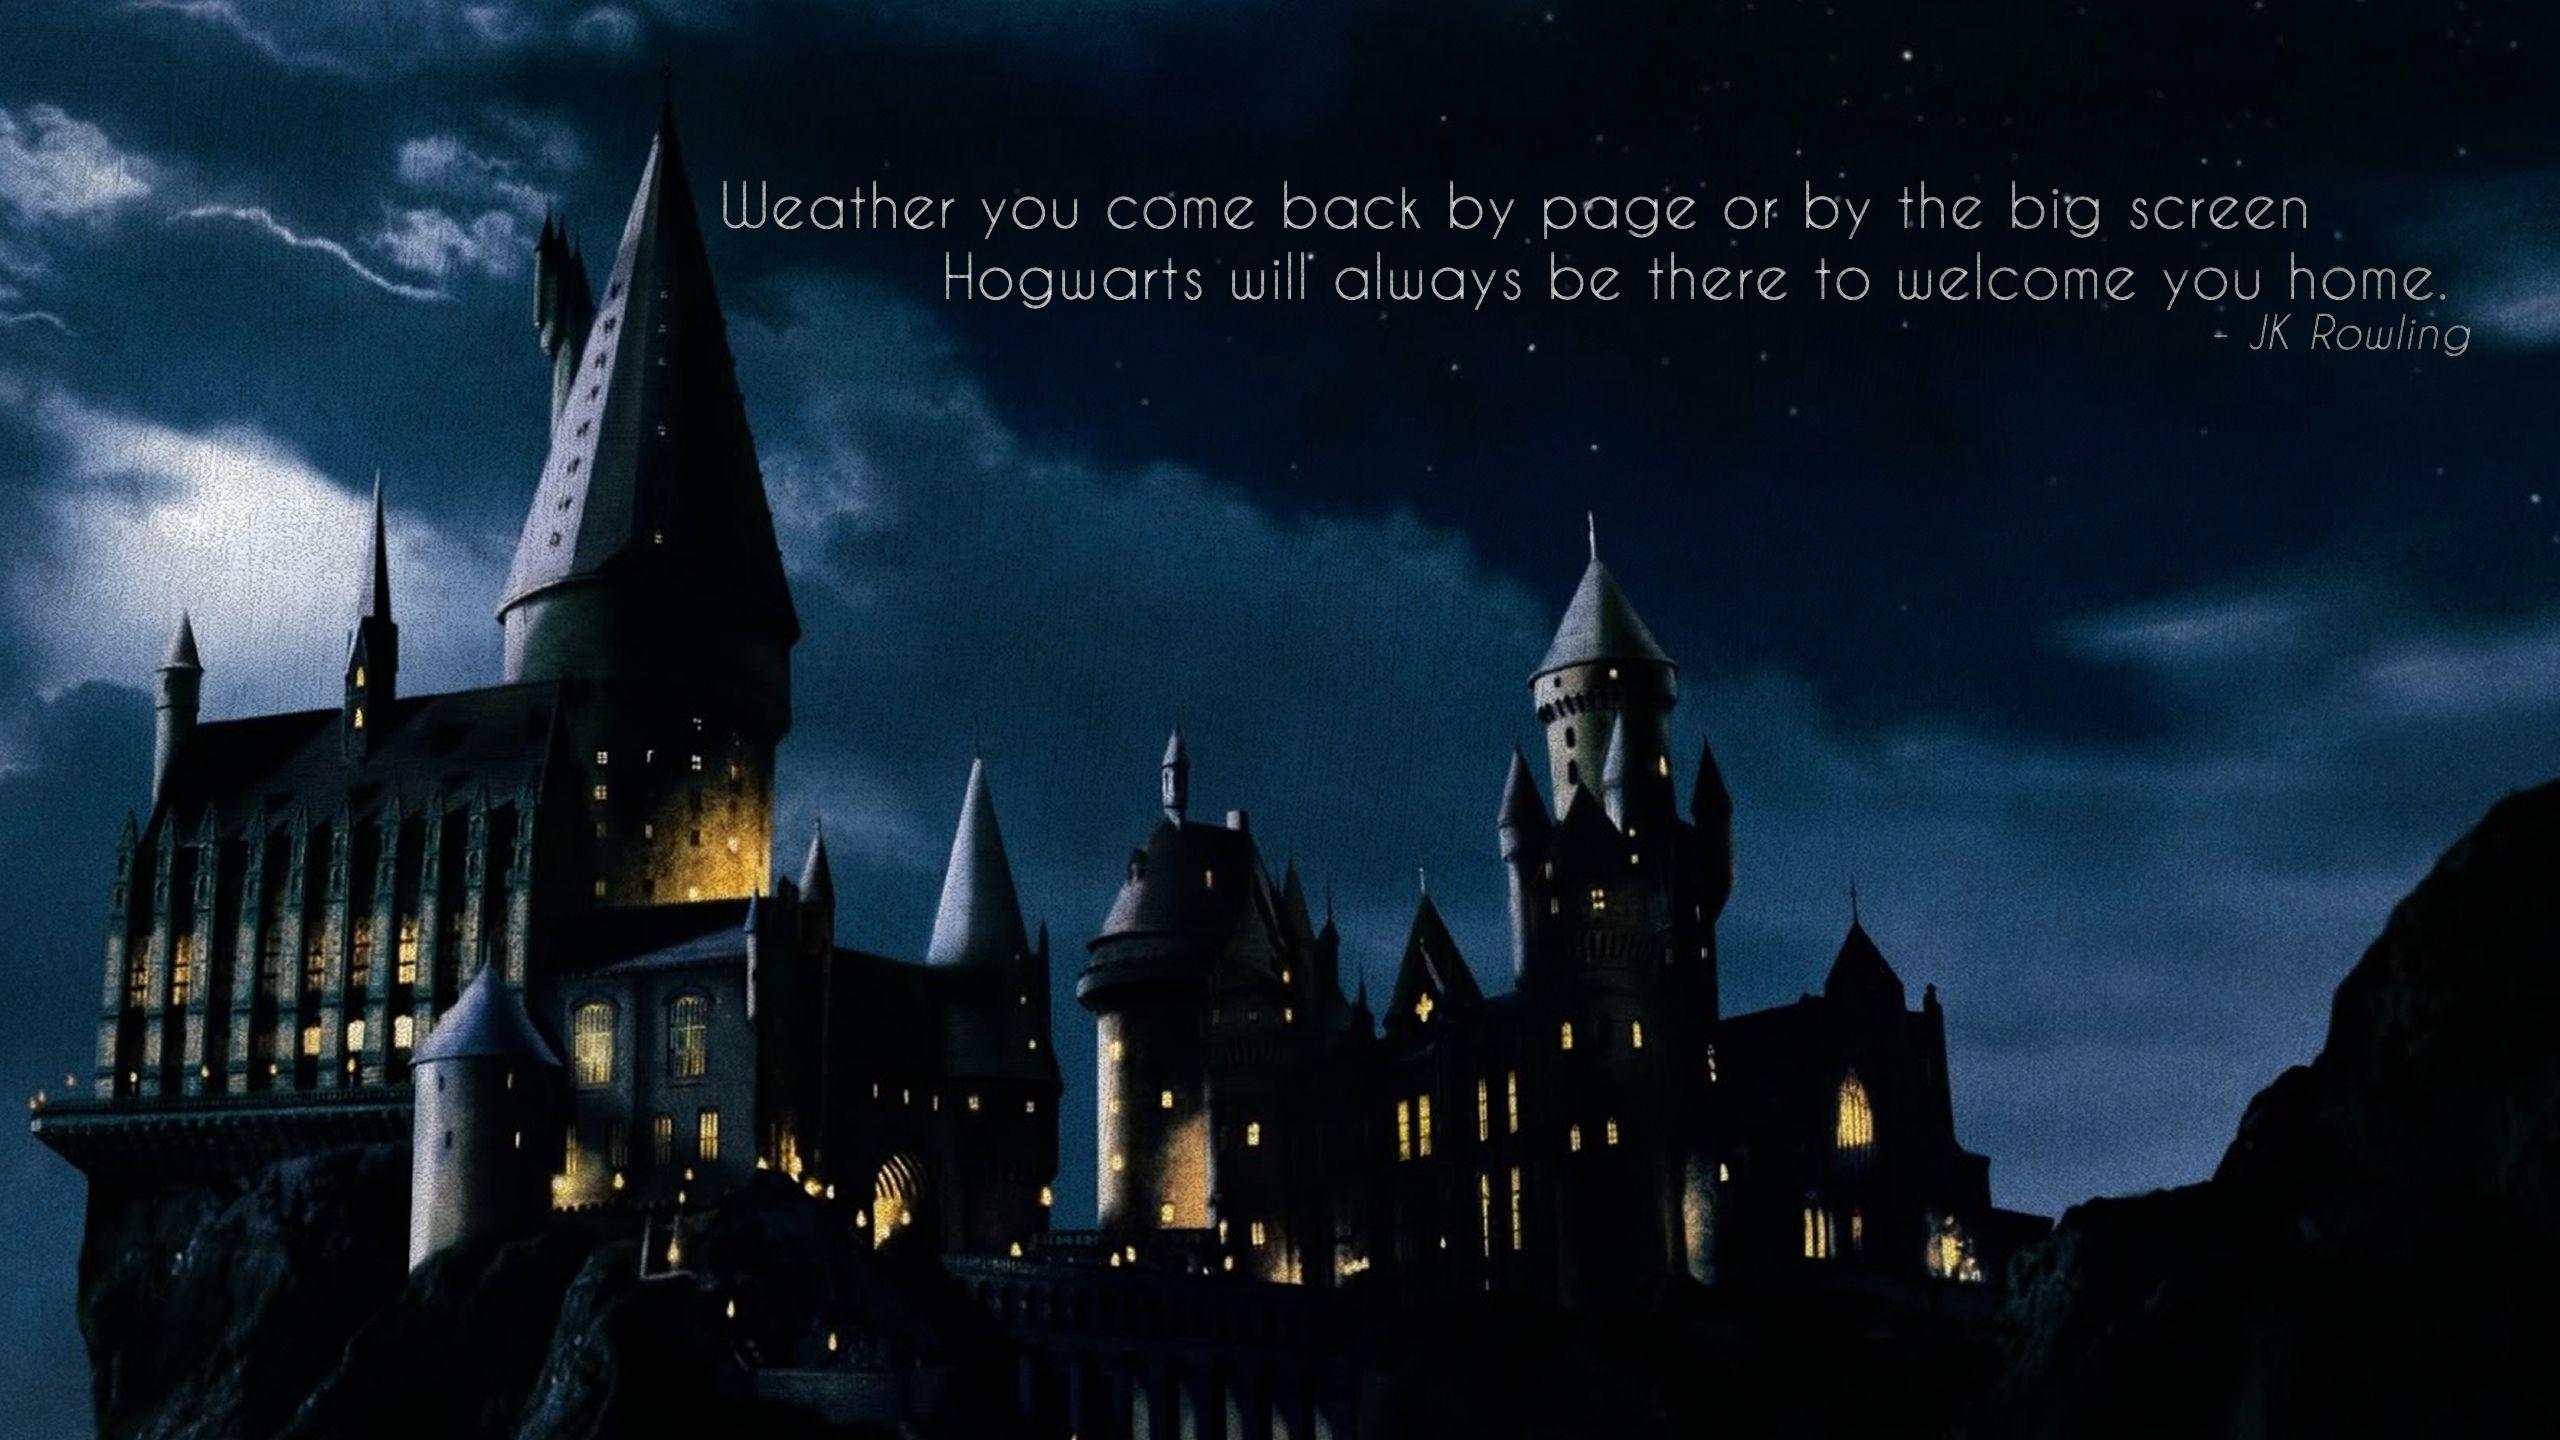 Inspirational Quote Wallpaper For Surface Pro 4 Harry Potter Fond D 233 Cran Hd Arri 232 Re Plan 2560x1440